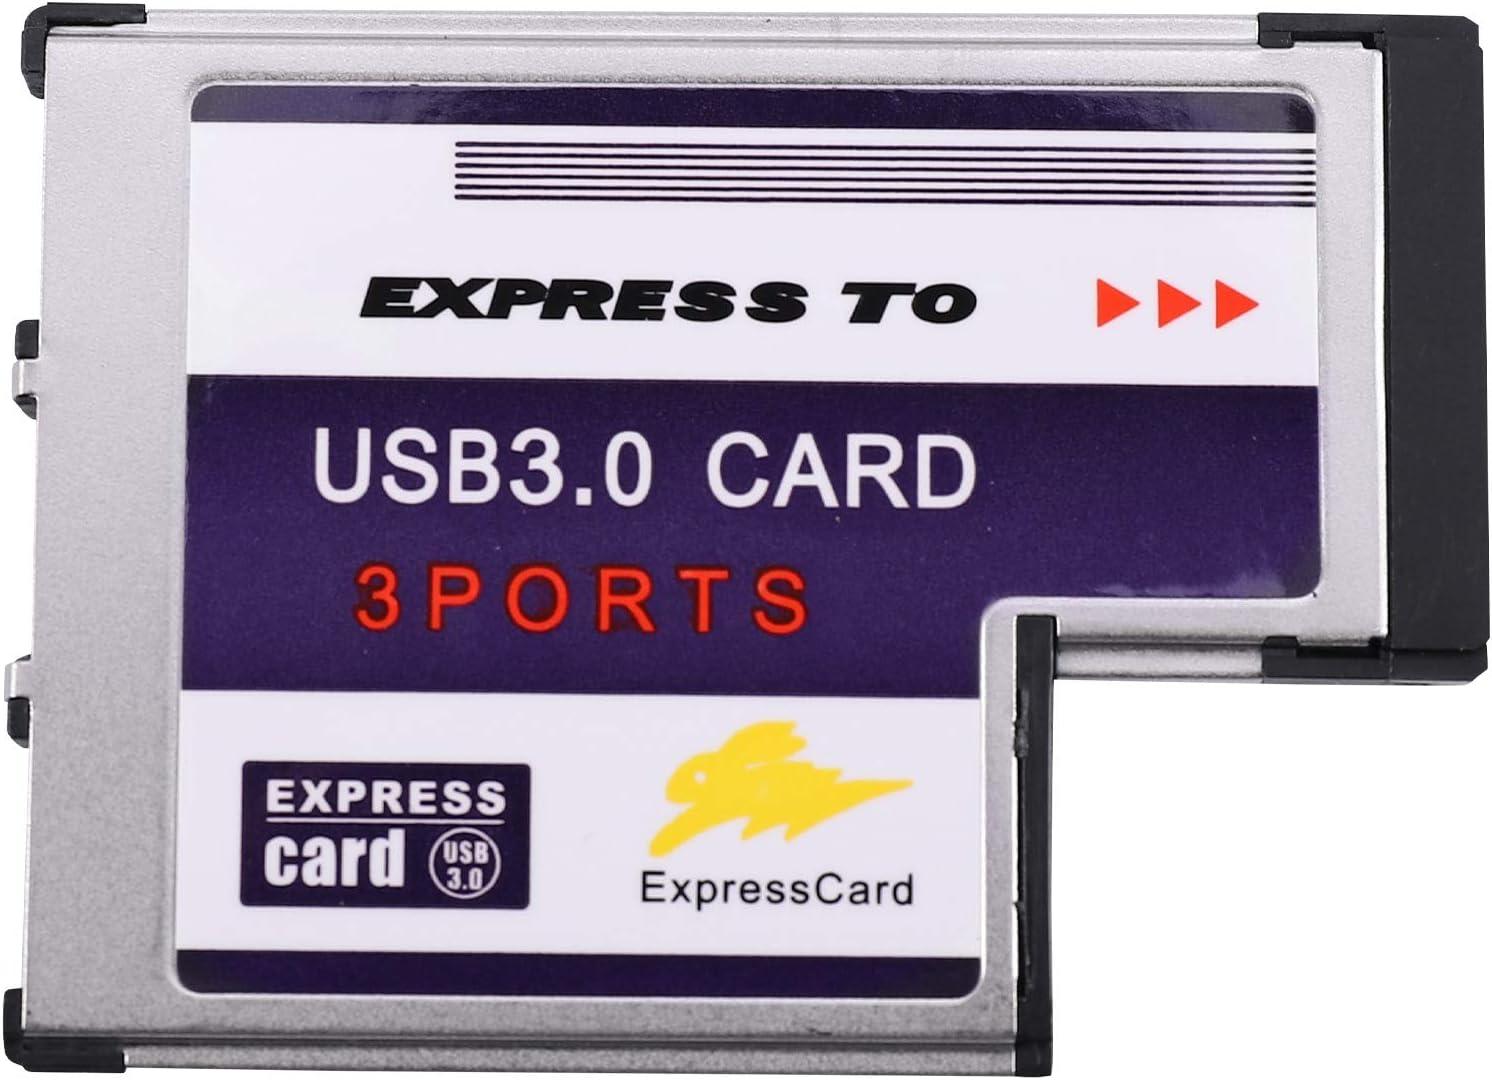 YeBetter 3 Port In a popularity Elegant Hidden Inside USB Card 54mm Express to Conve